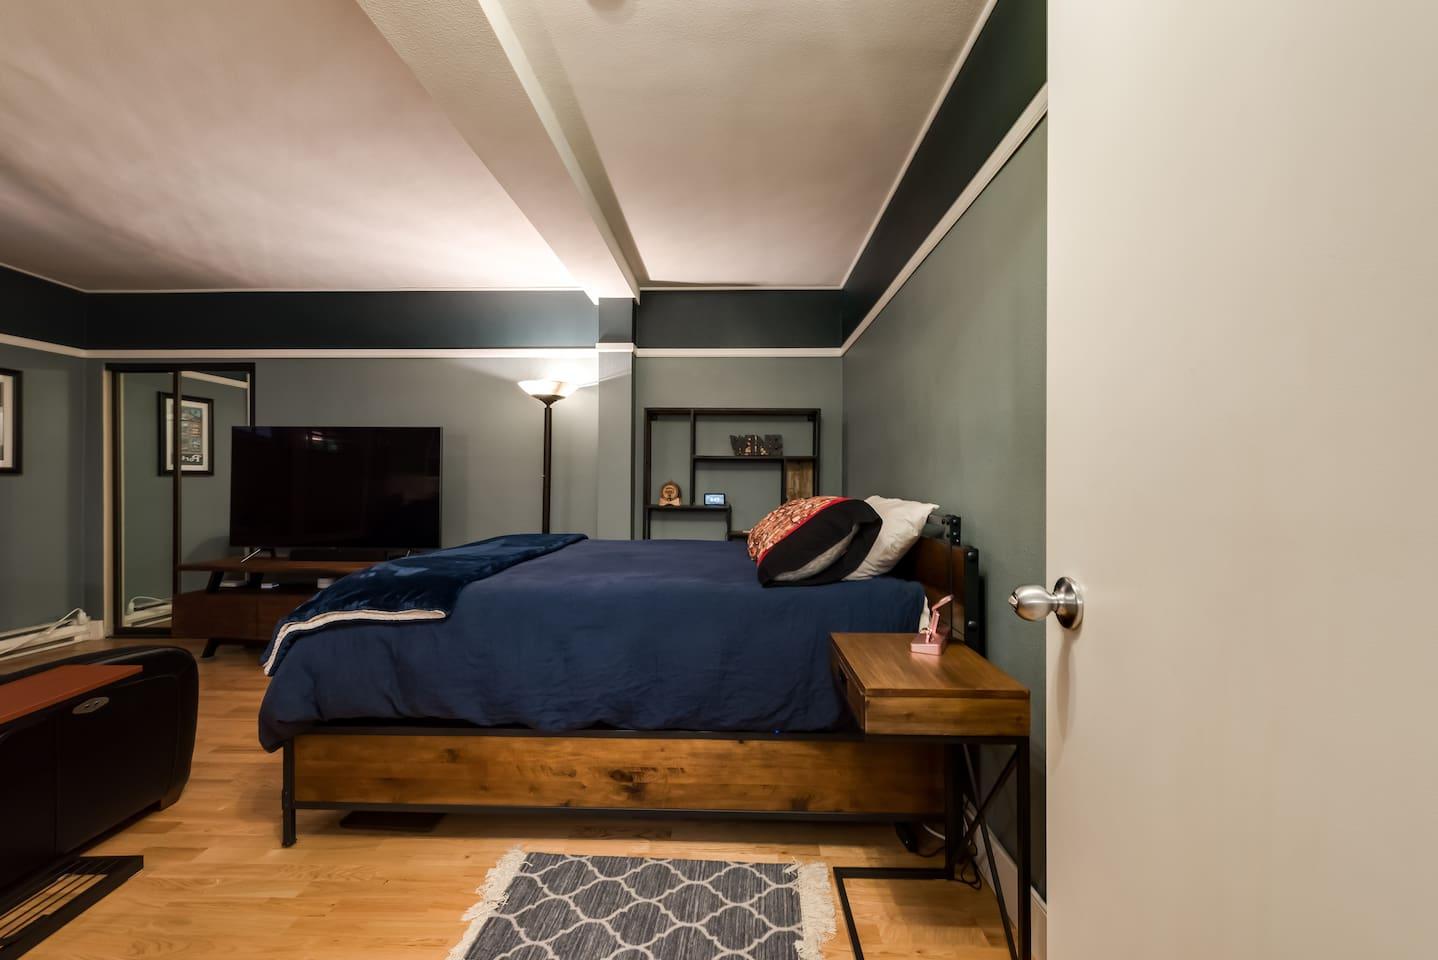 Queen memory foam bed with adjustable base.